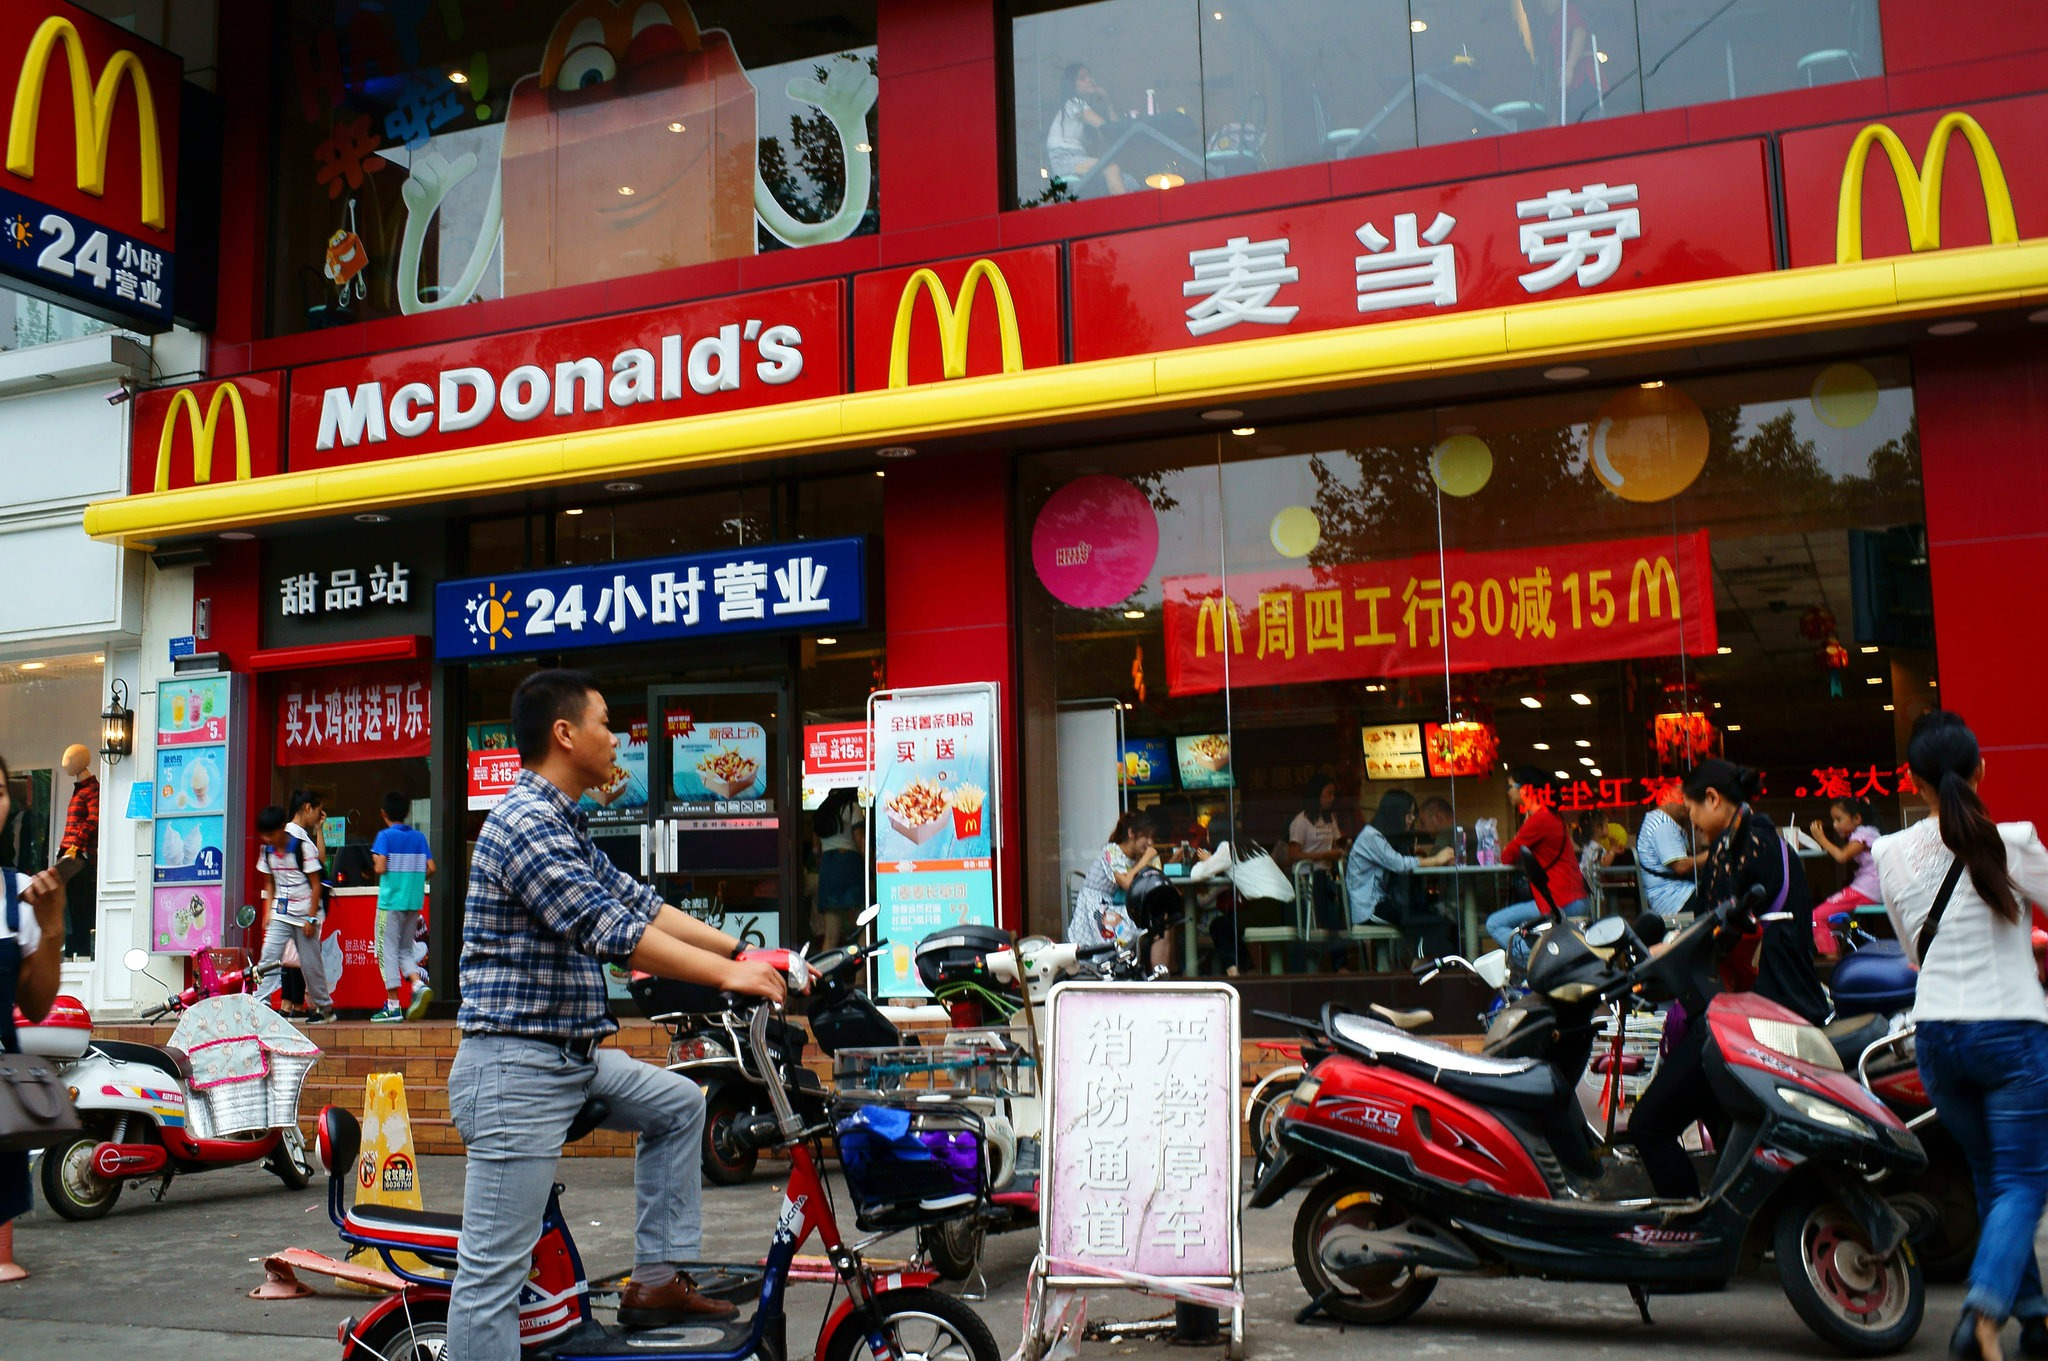 MacDonald's China 2020